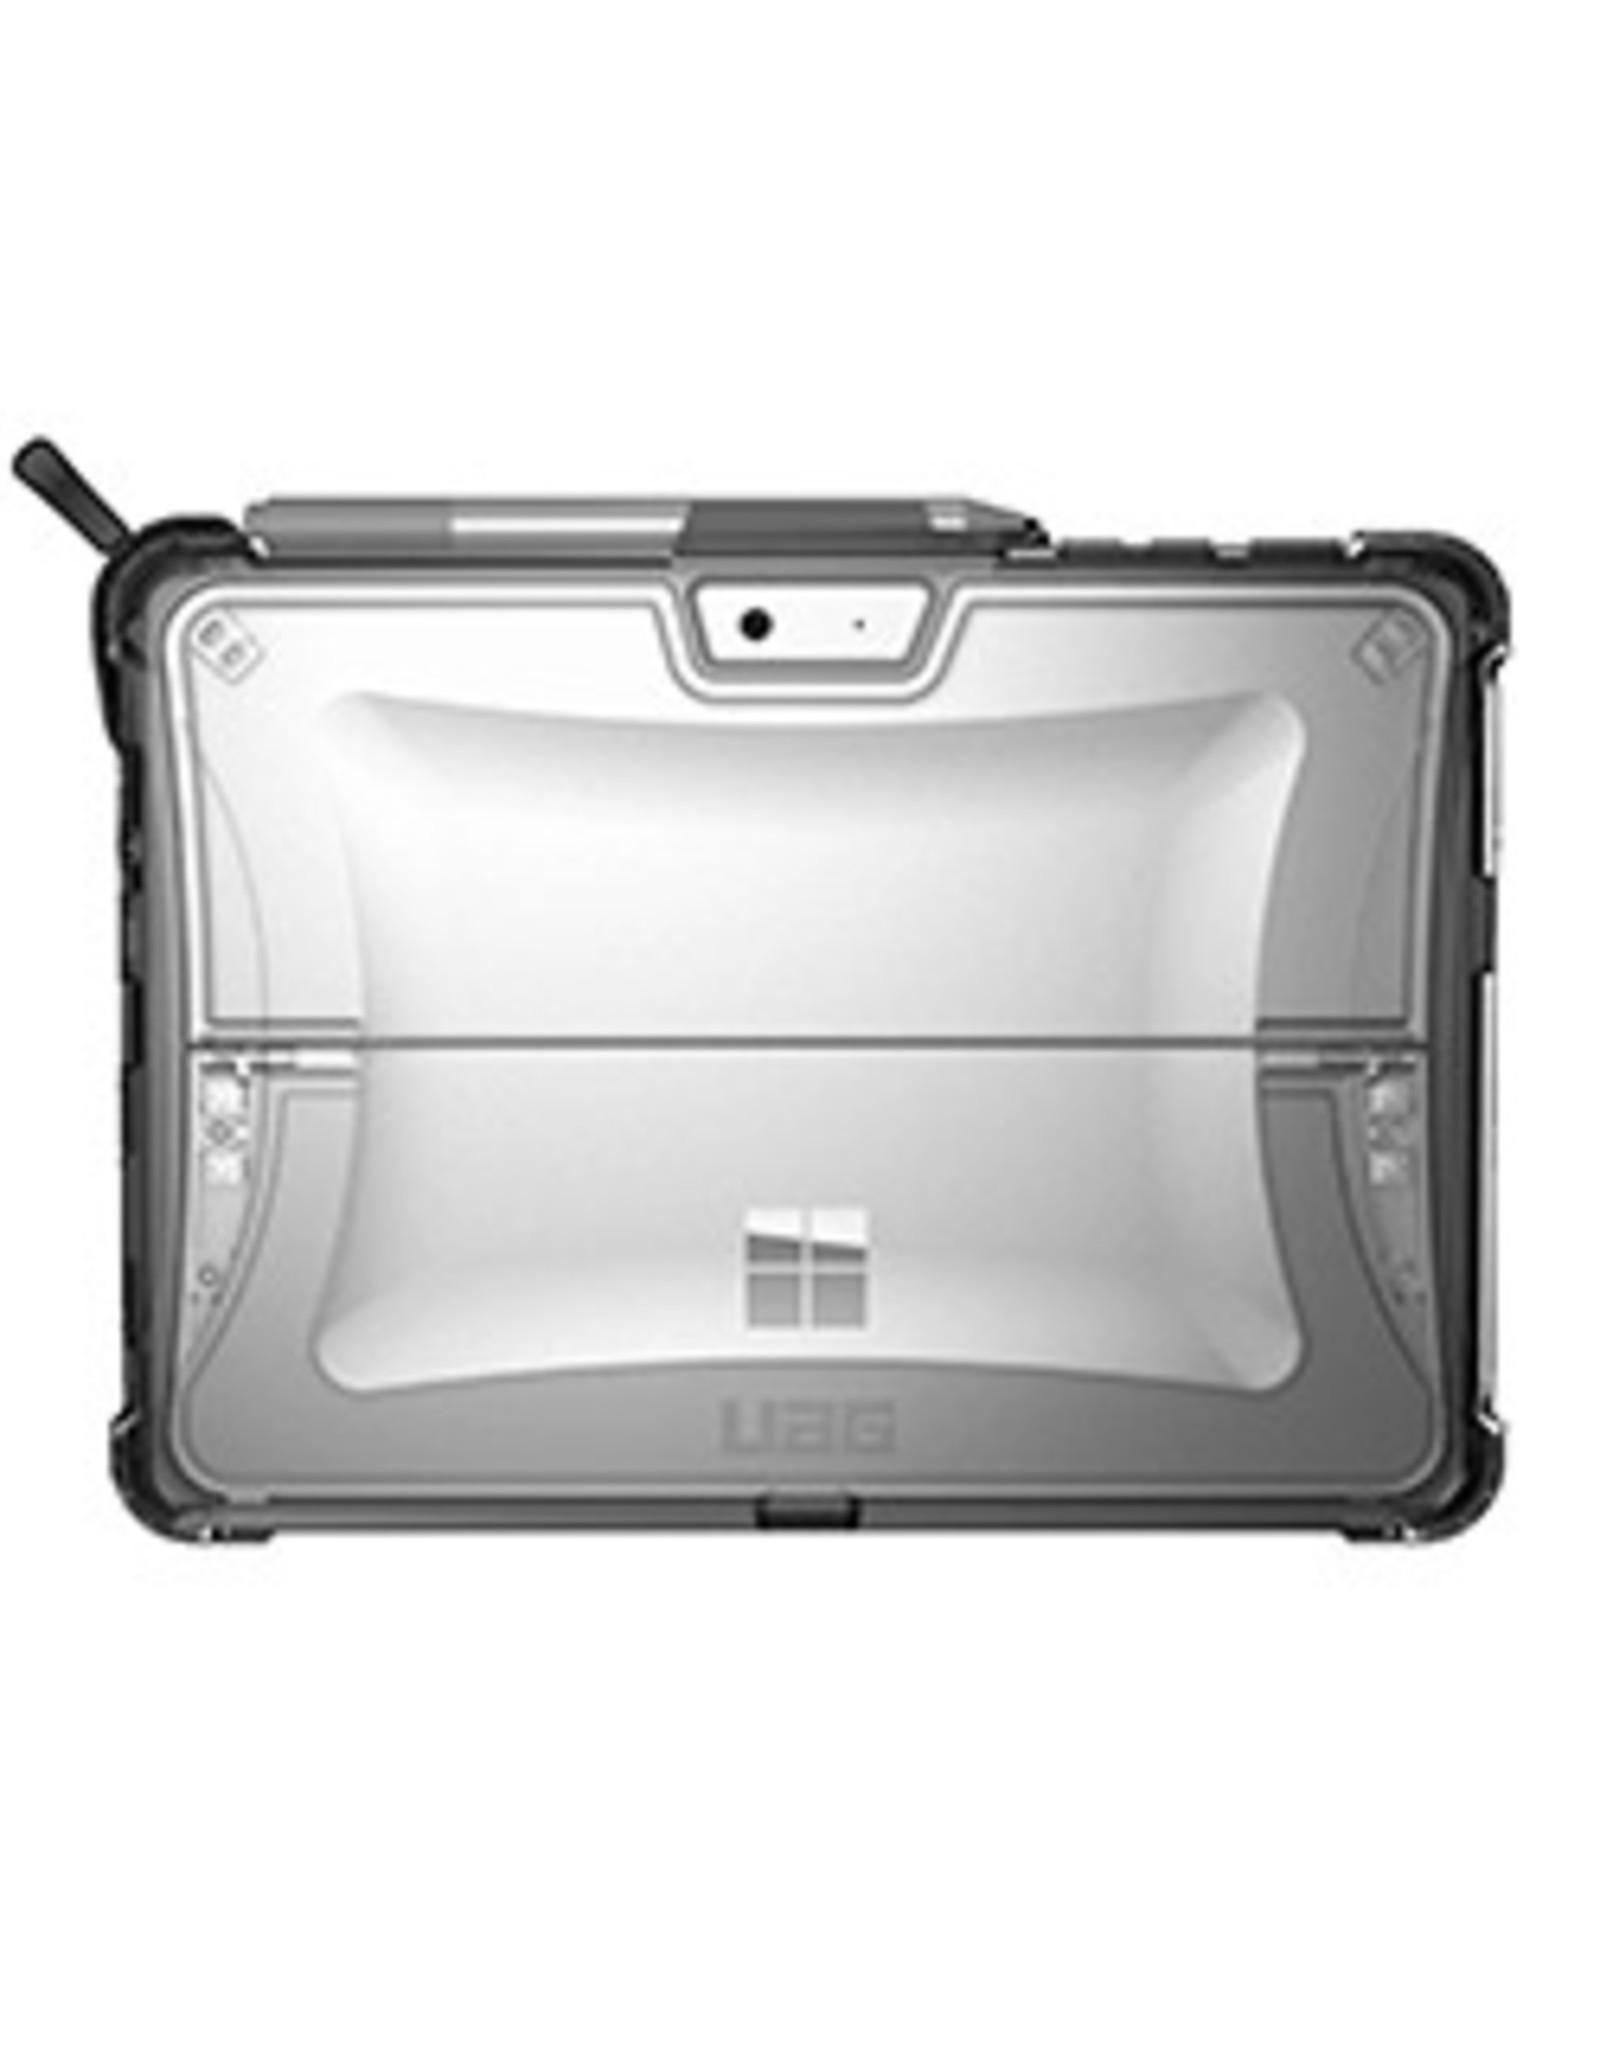 UAG UAG | Microsoft Surface Go Transparent (Ice) Plyo Series Case 15-04206